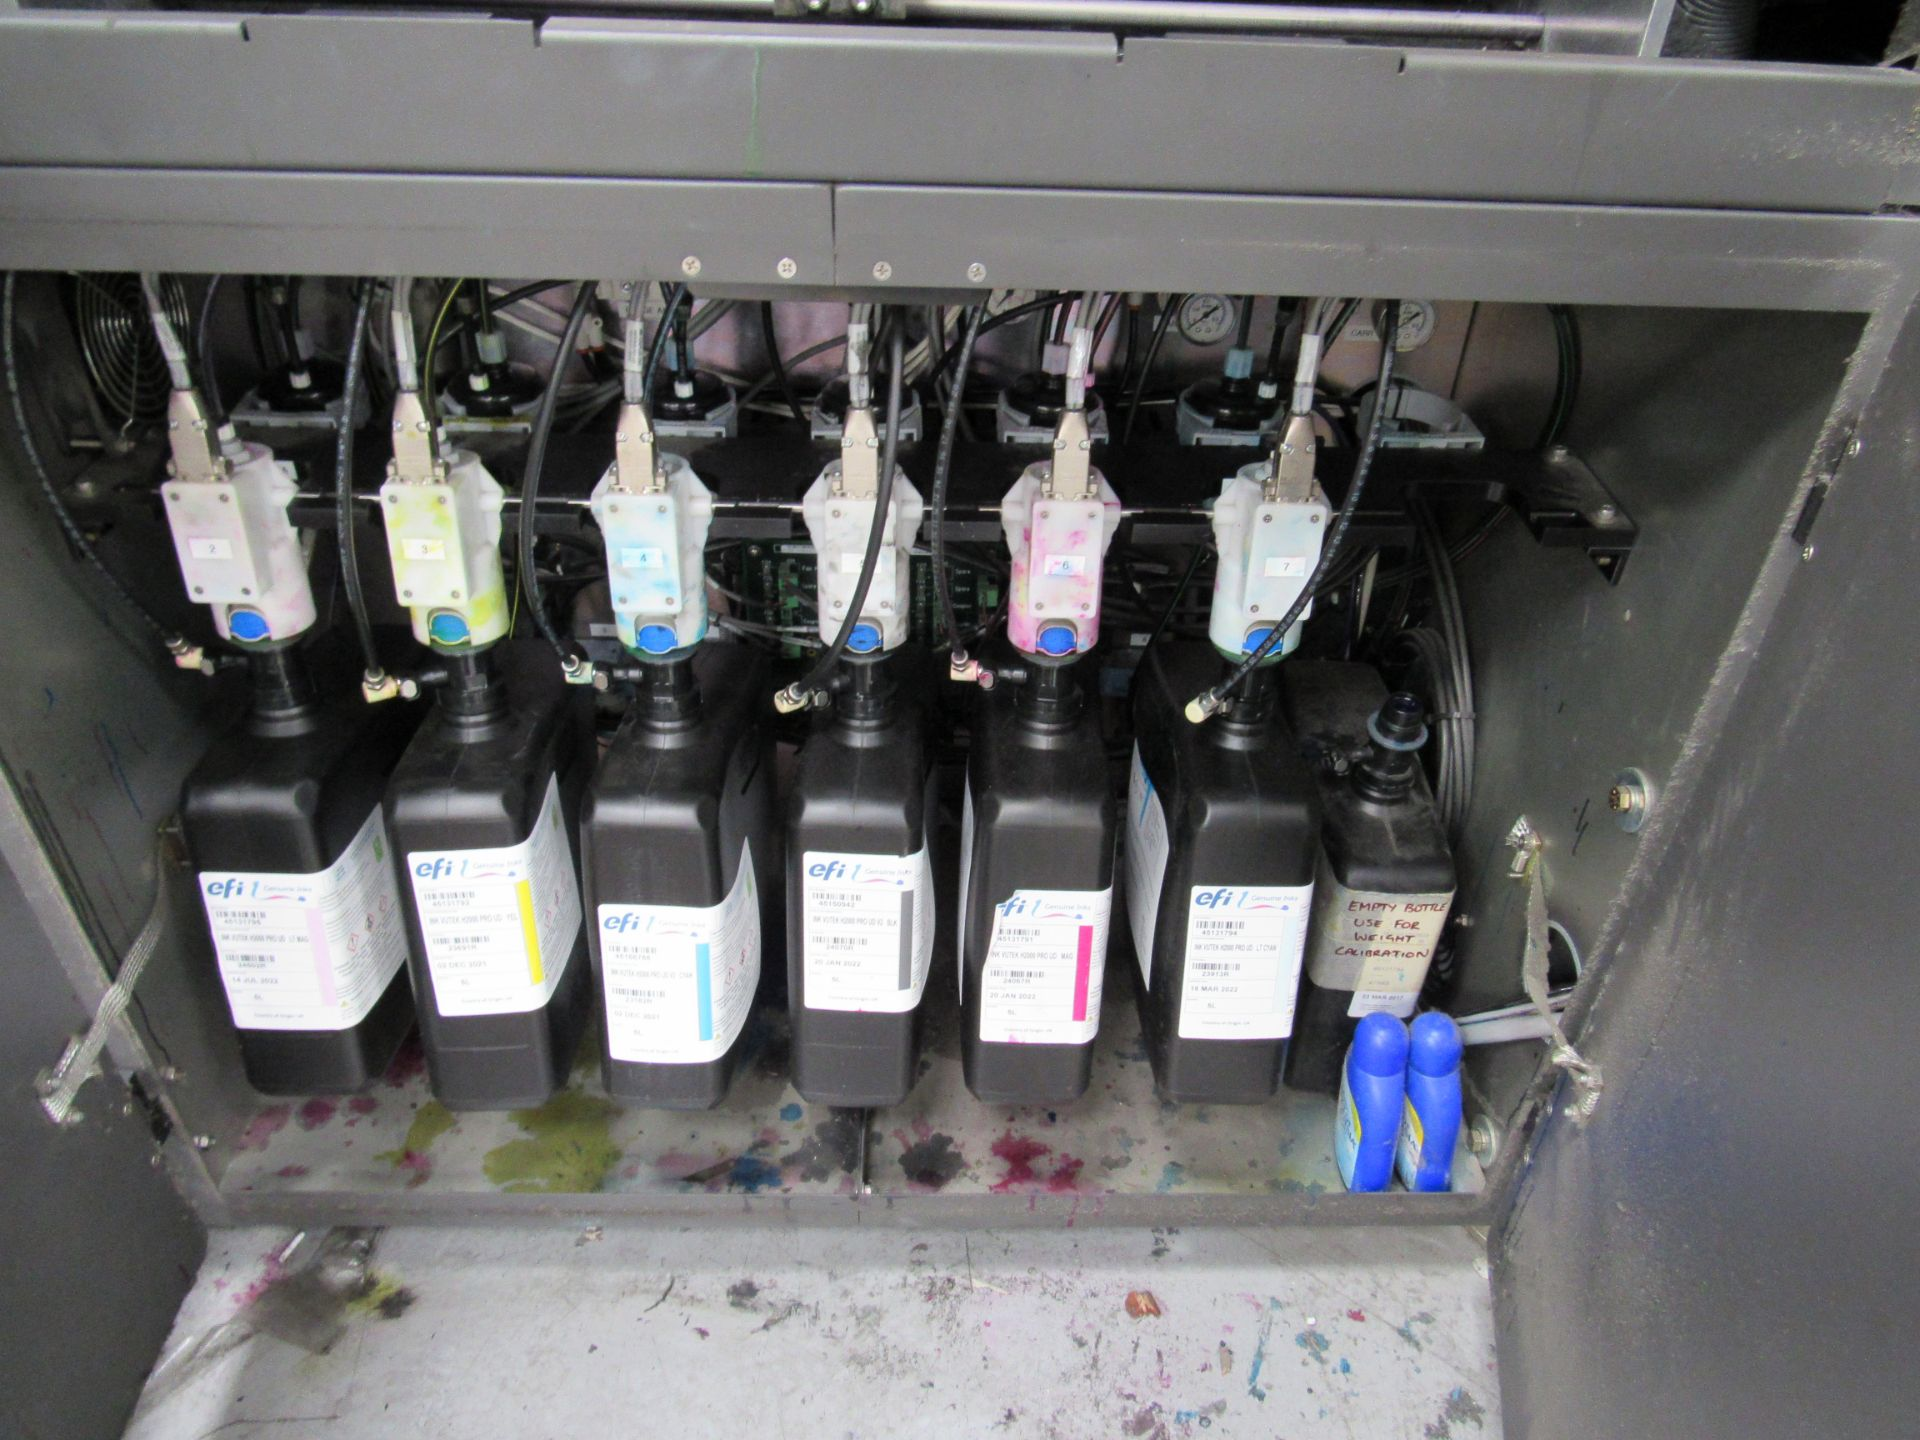 EFI VUTEk H2000 Pro - UltraDrop Technology UV 2m Hybrid Printer, Serial Number 262013, Dec 2014, - Image 11 of 16